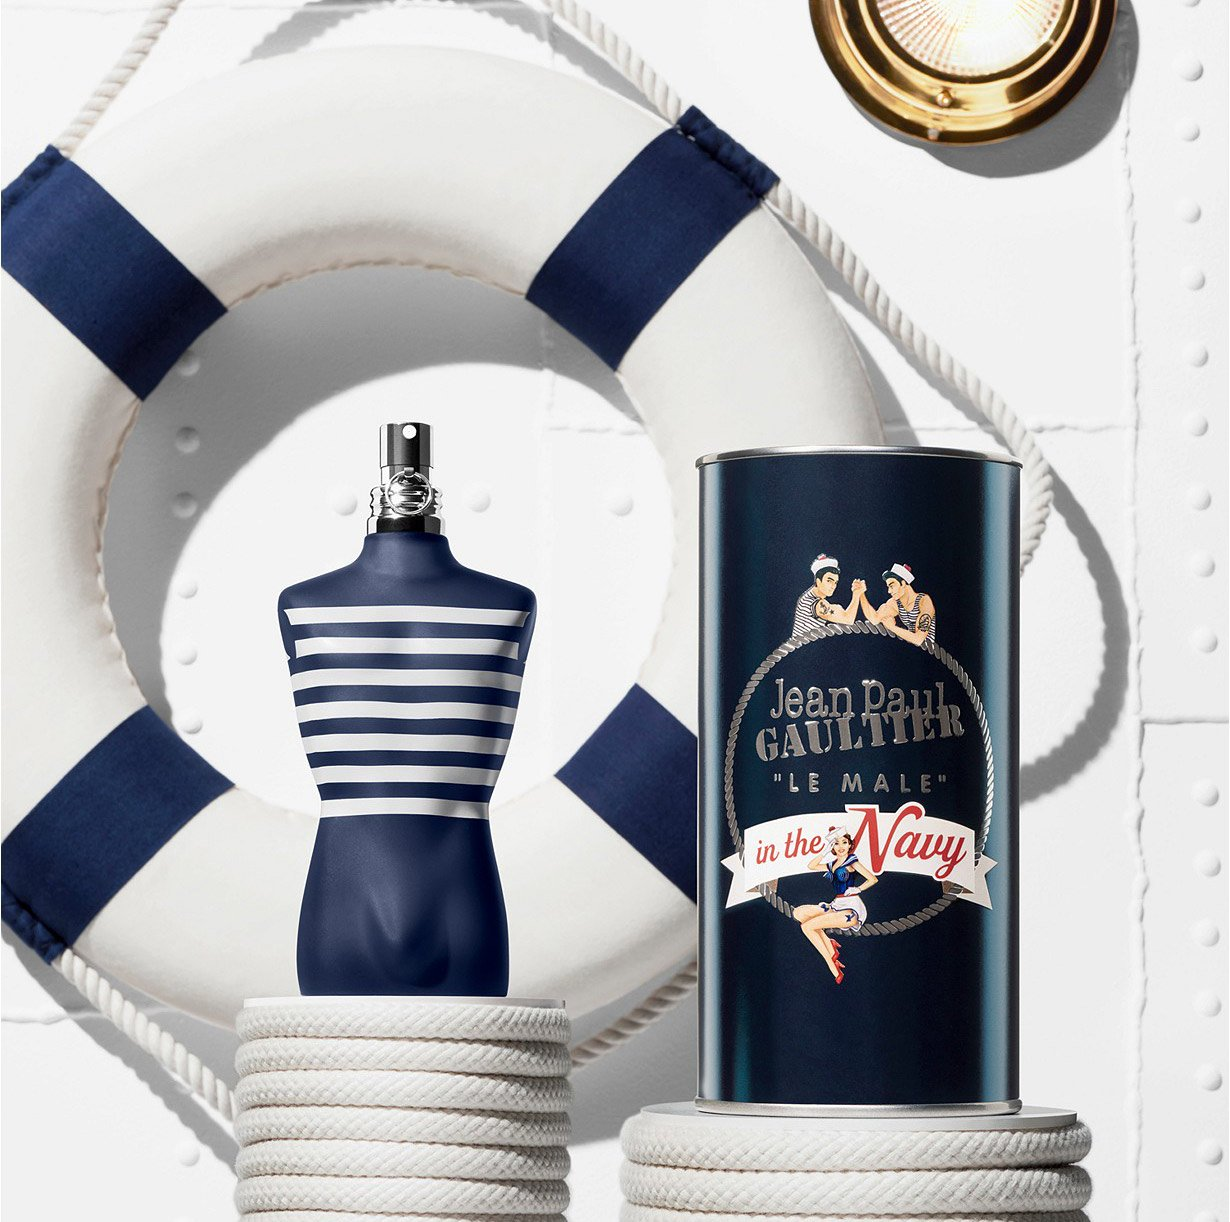 Jean Paul Gaultier Le Male In The Navy Perfume